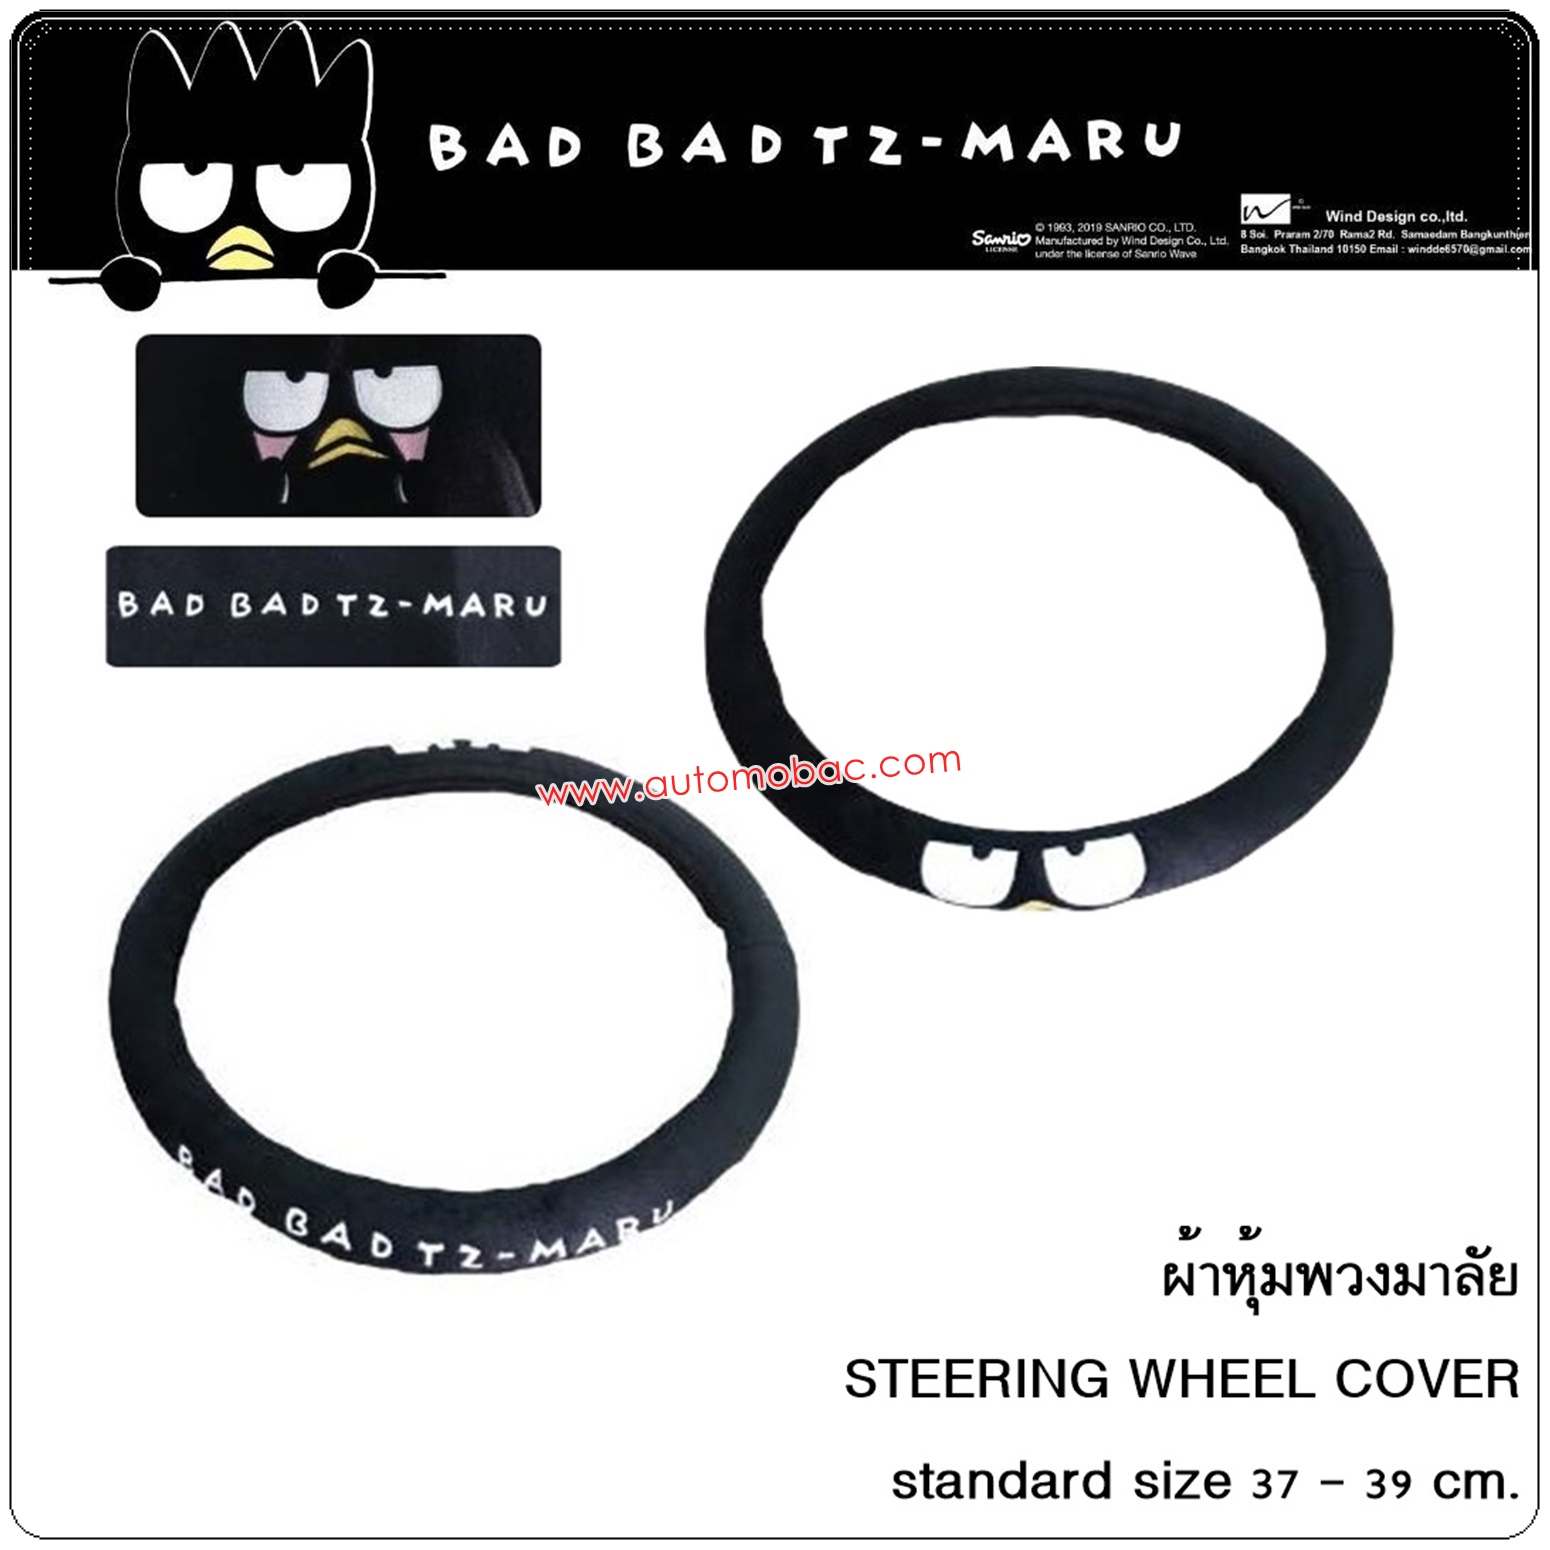 Bad Badtz-Maru BLACK แบดมารุ สีดำ ที่หุ้มพวงมาลัย ป้องกันรอยขีดข่วน ใช้ได้กับ 37-39 cm. ลิขสิทธิ์แท้